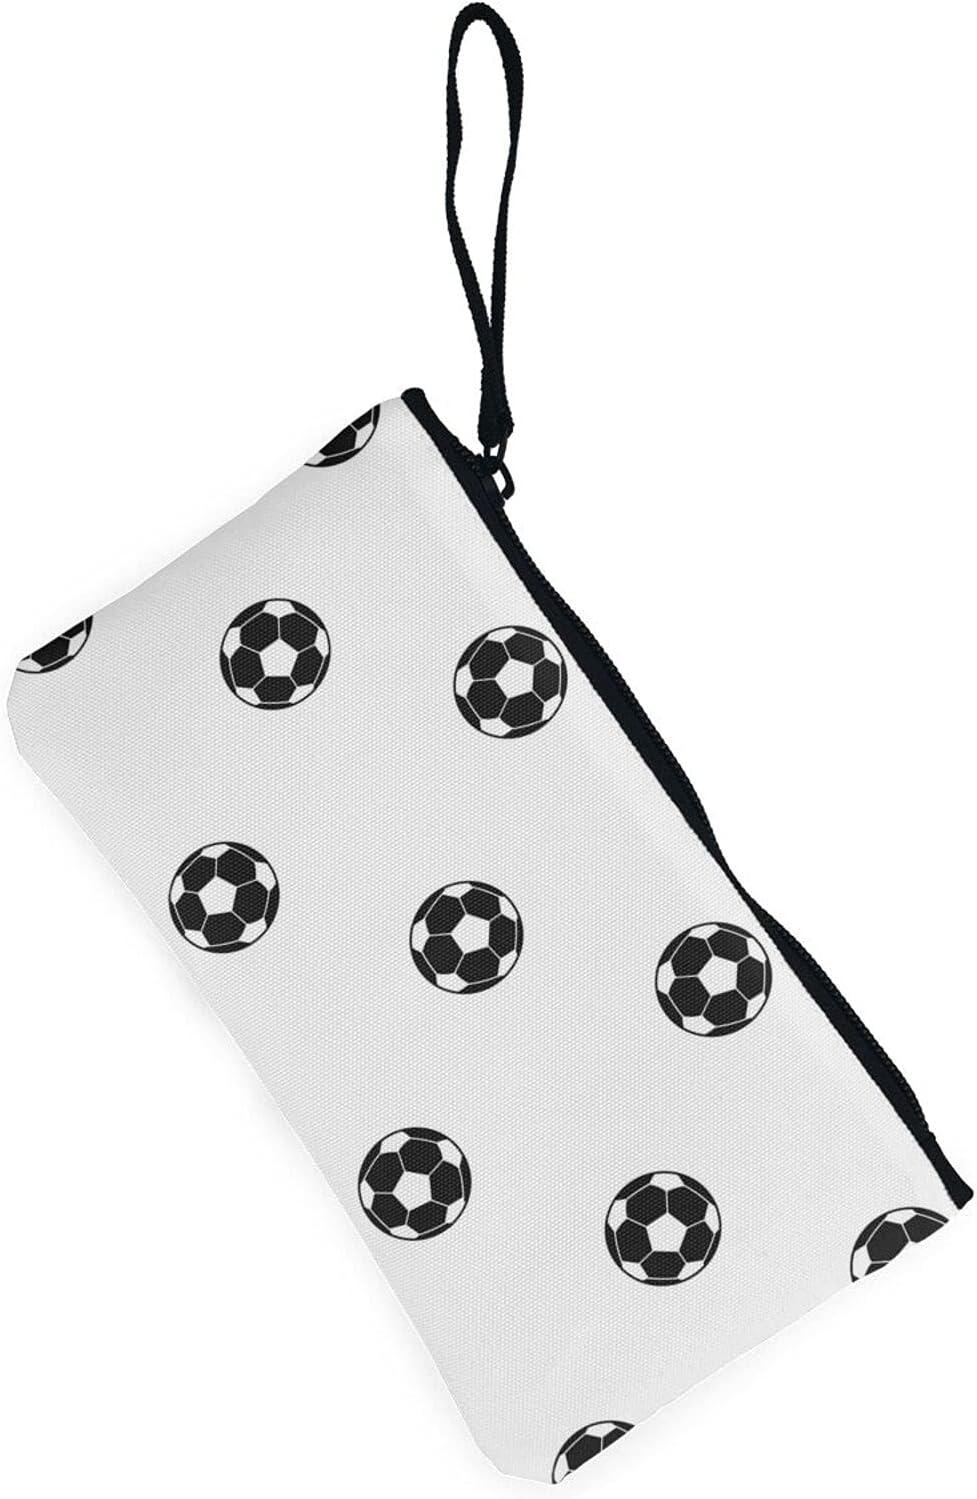 AORRUAM Soccer ball pattern Canvas Coin Purse,Canvas Zipper Pencil Cases,Canvas Change Purse Pouch Mini Wallet Coin Bag